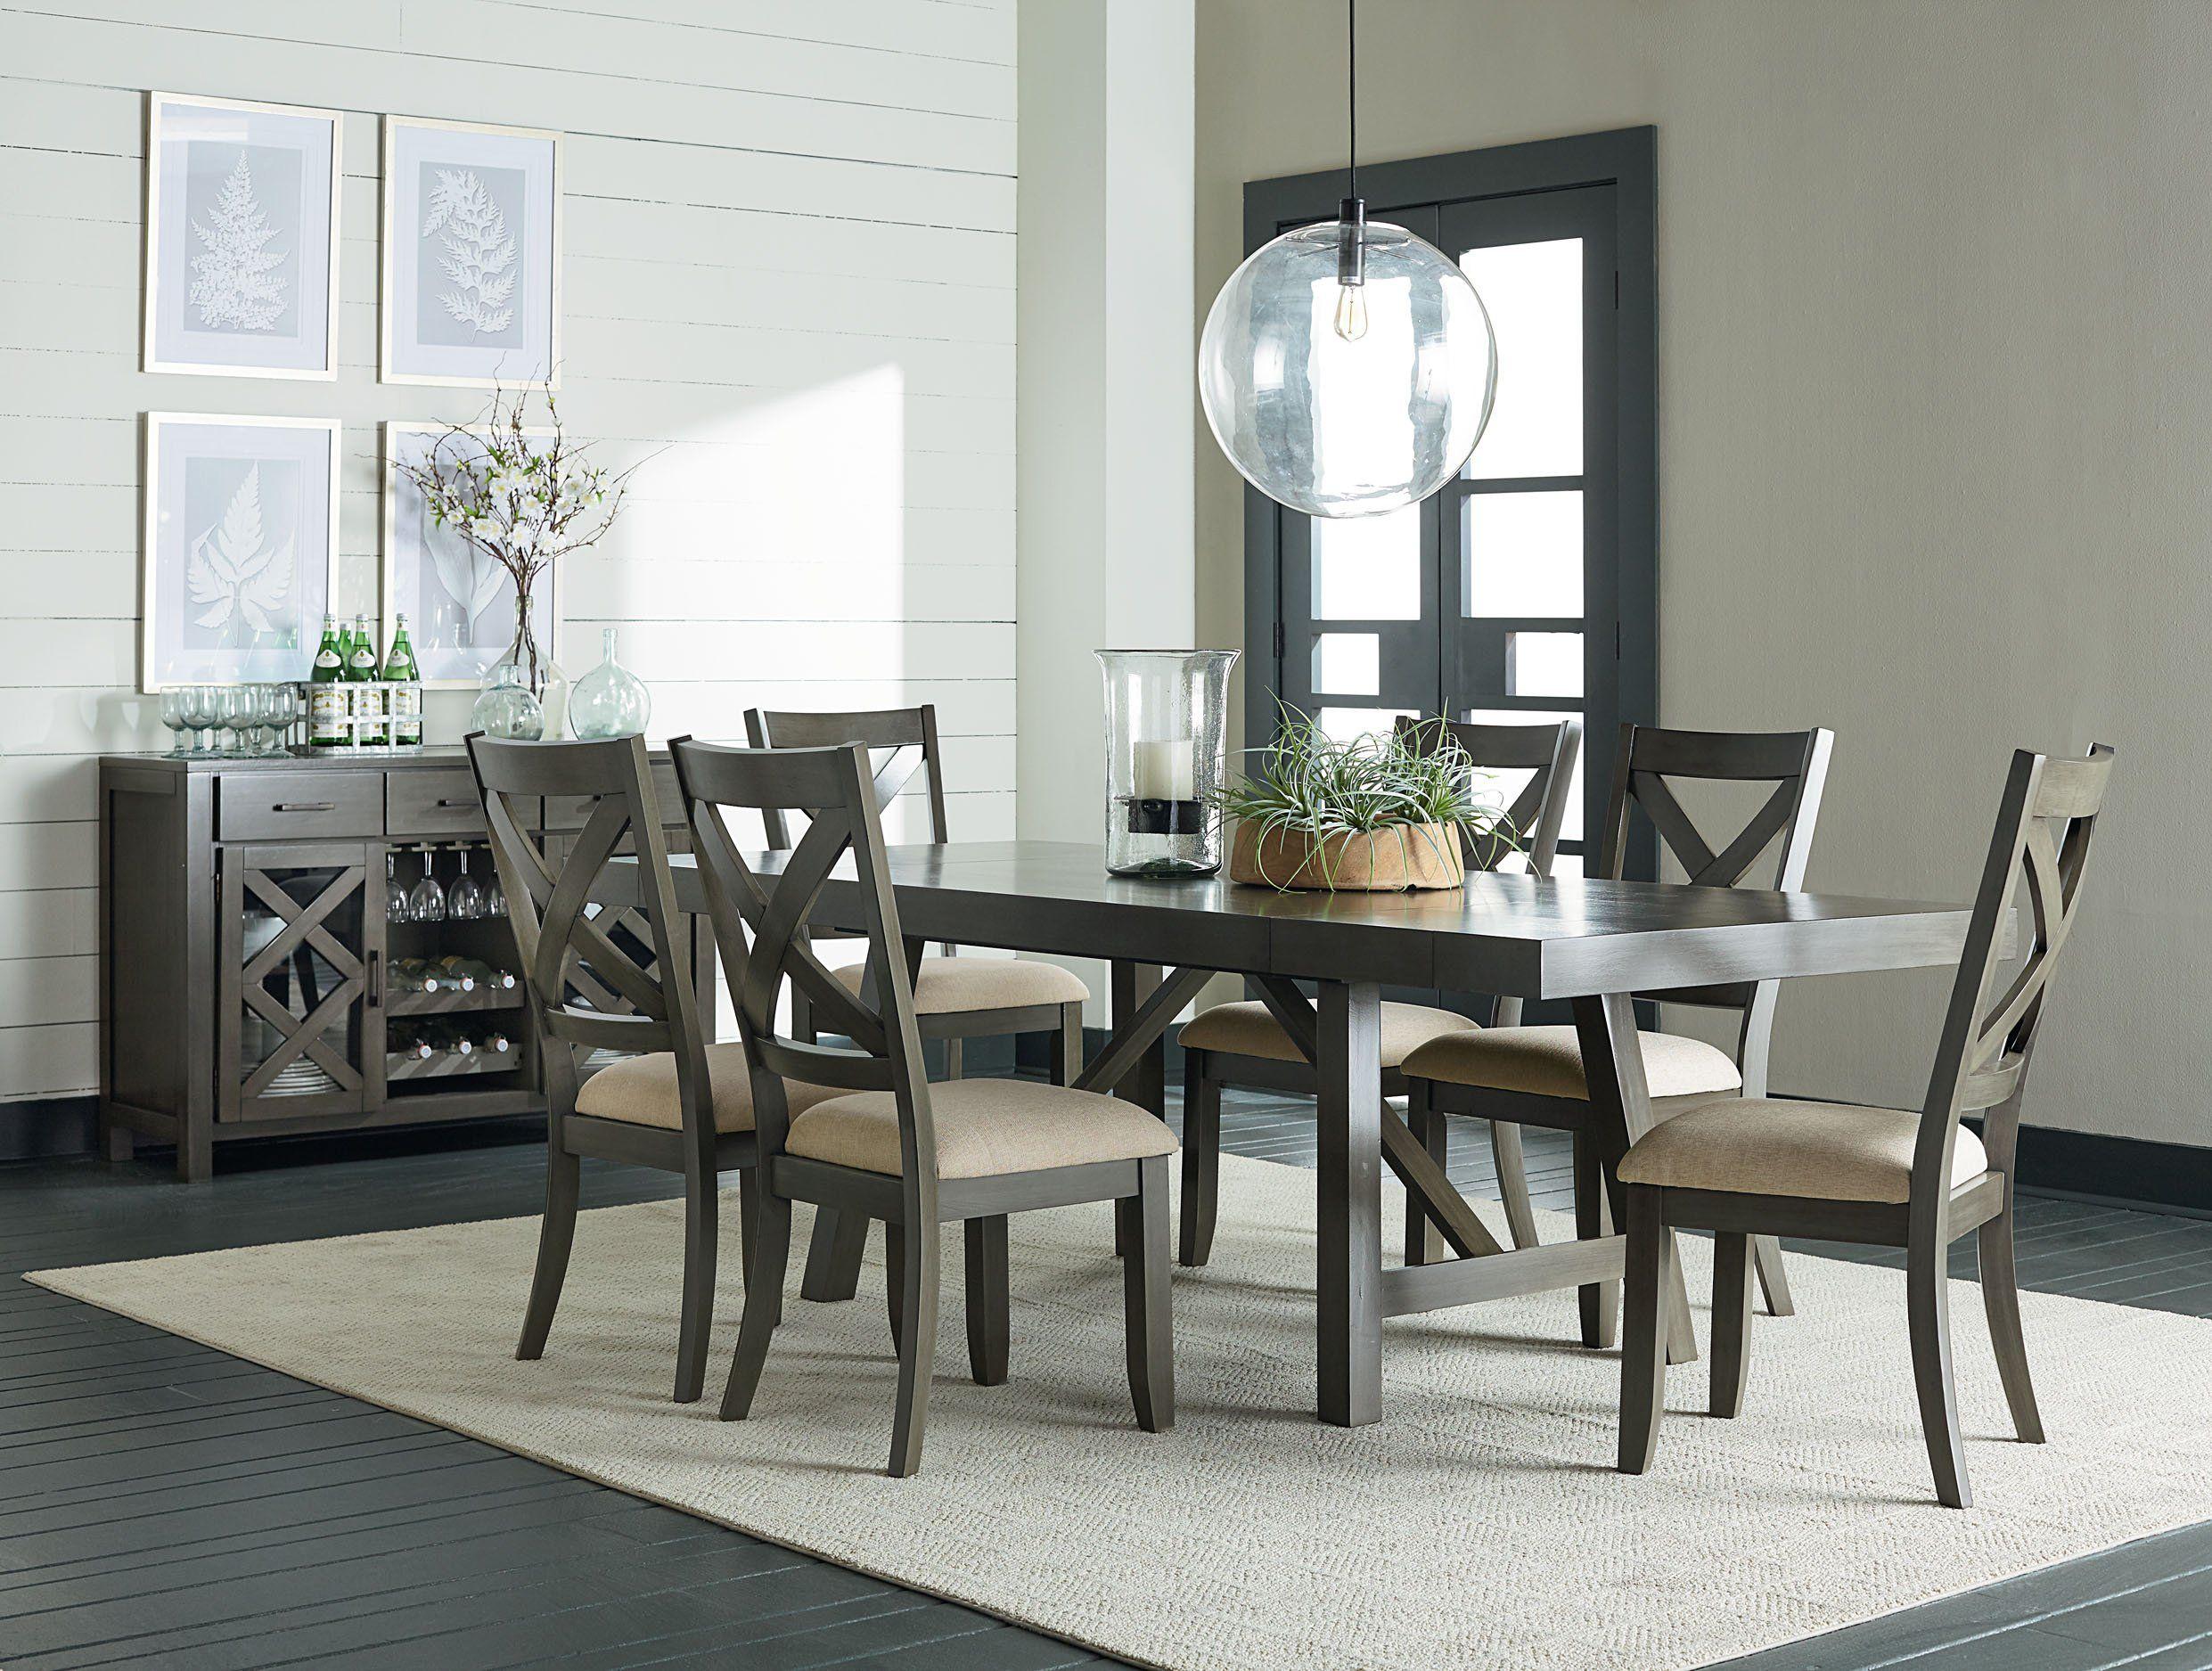 Omaha 9 Piece Dining Set   Kane's Furniture   Grey dining tables ...